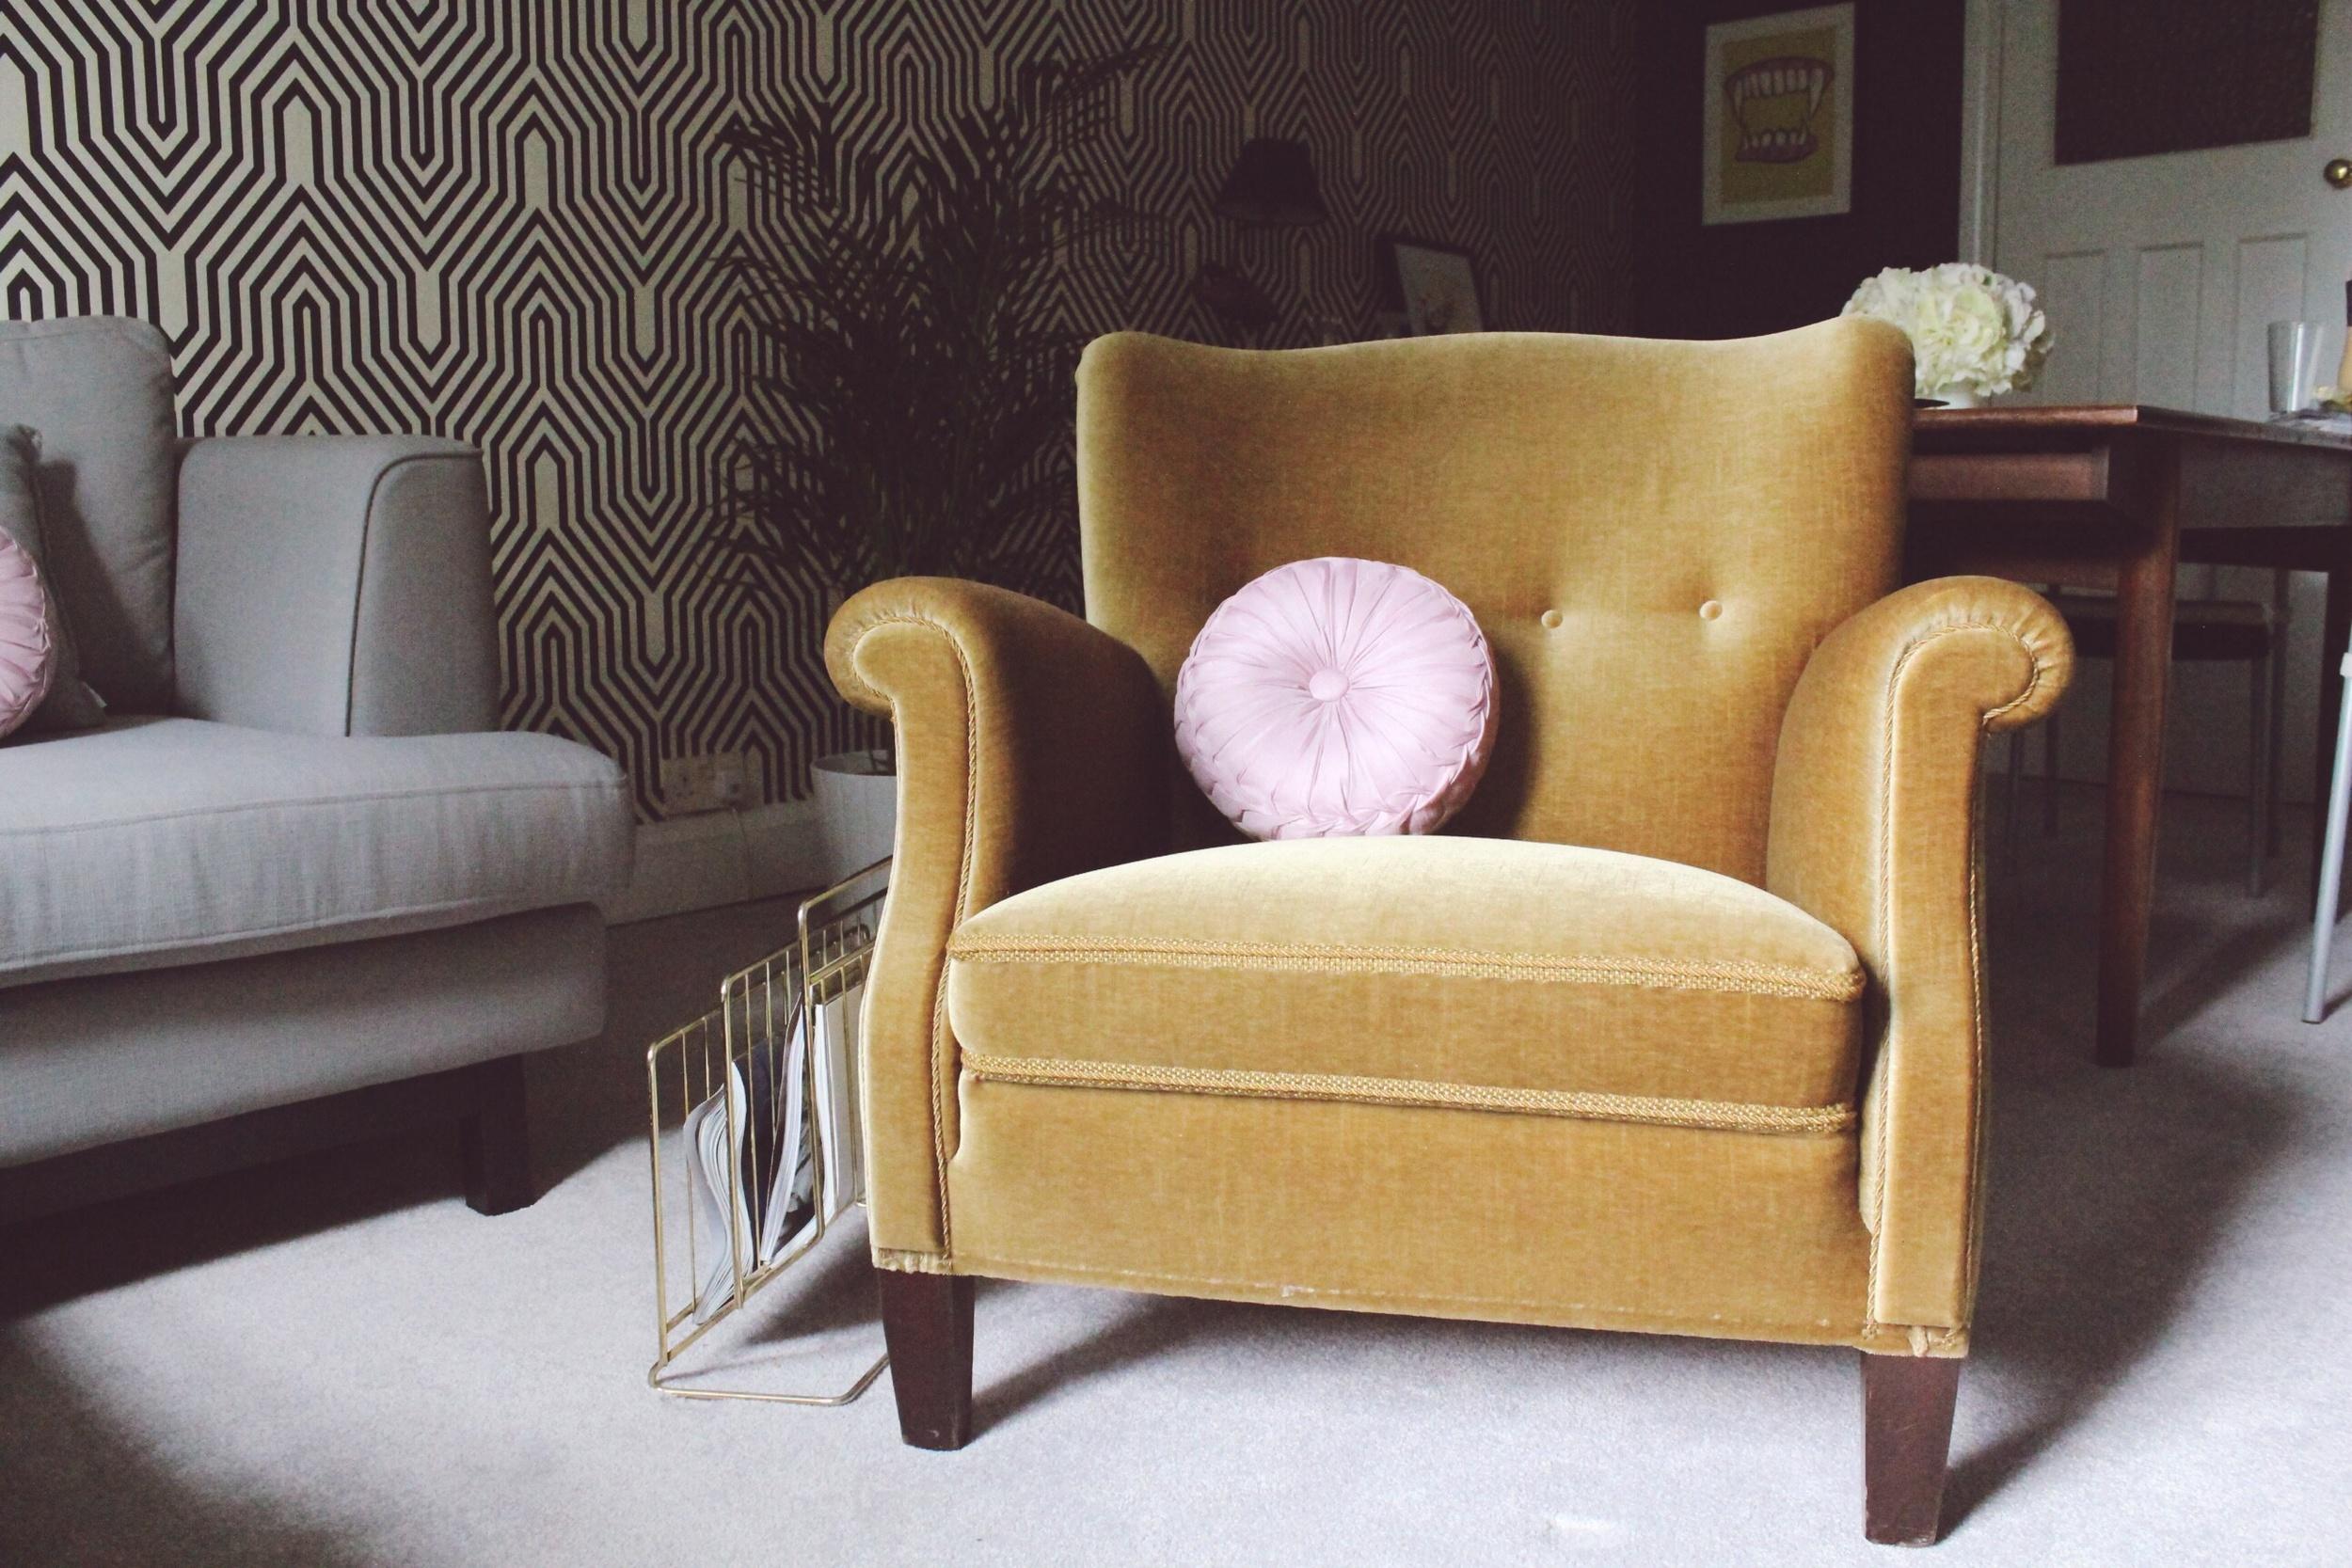 vintage arm chair covers in sri lanka the hunt for perfect armchair sarah akwisombe 50s green velvet